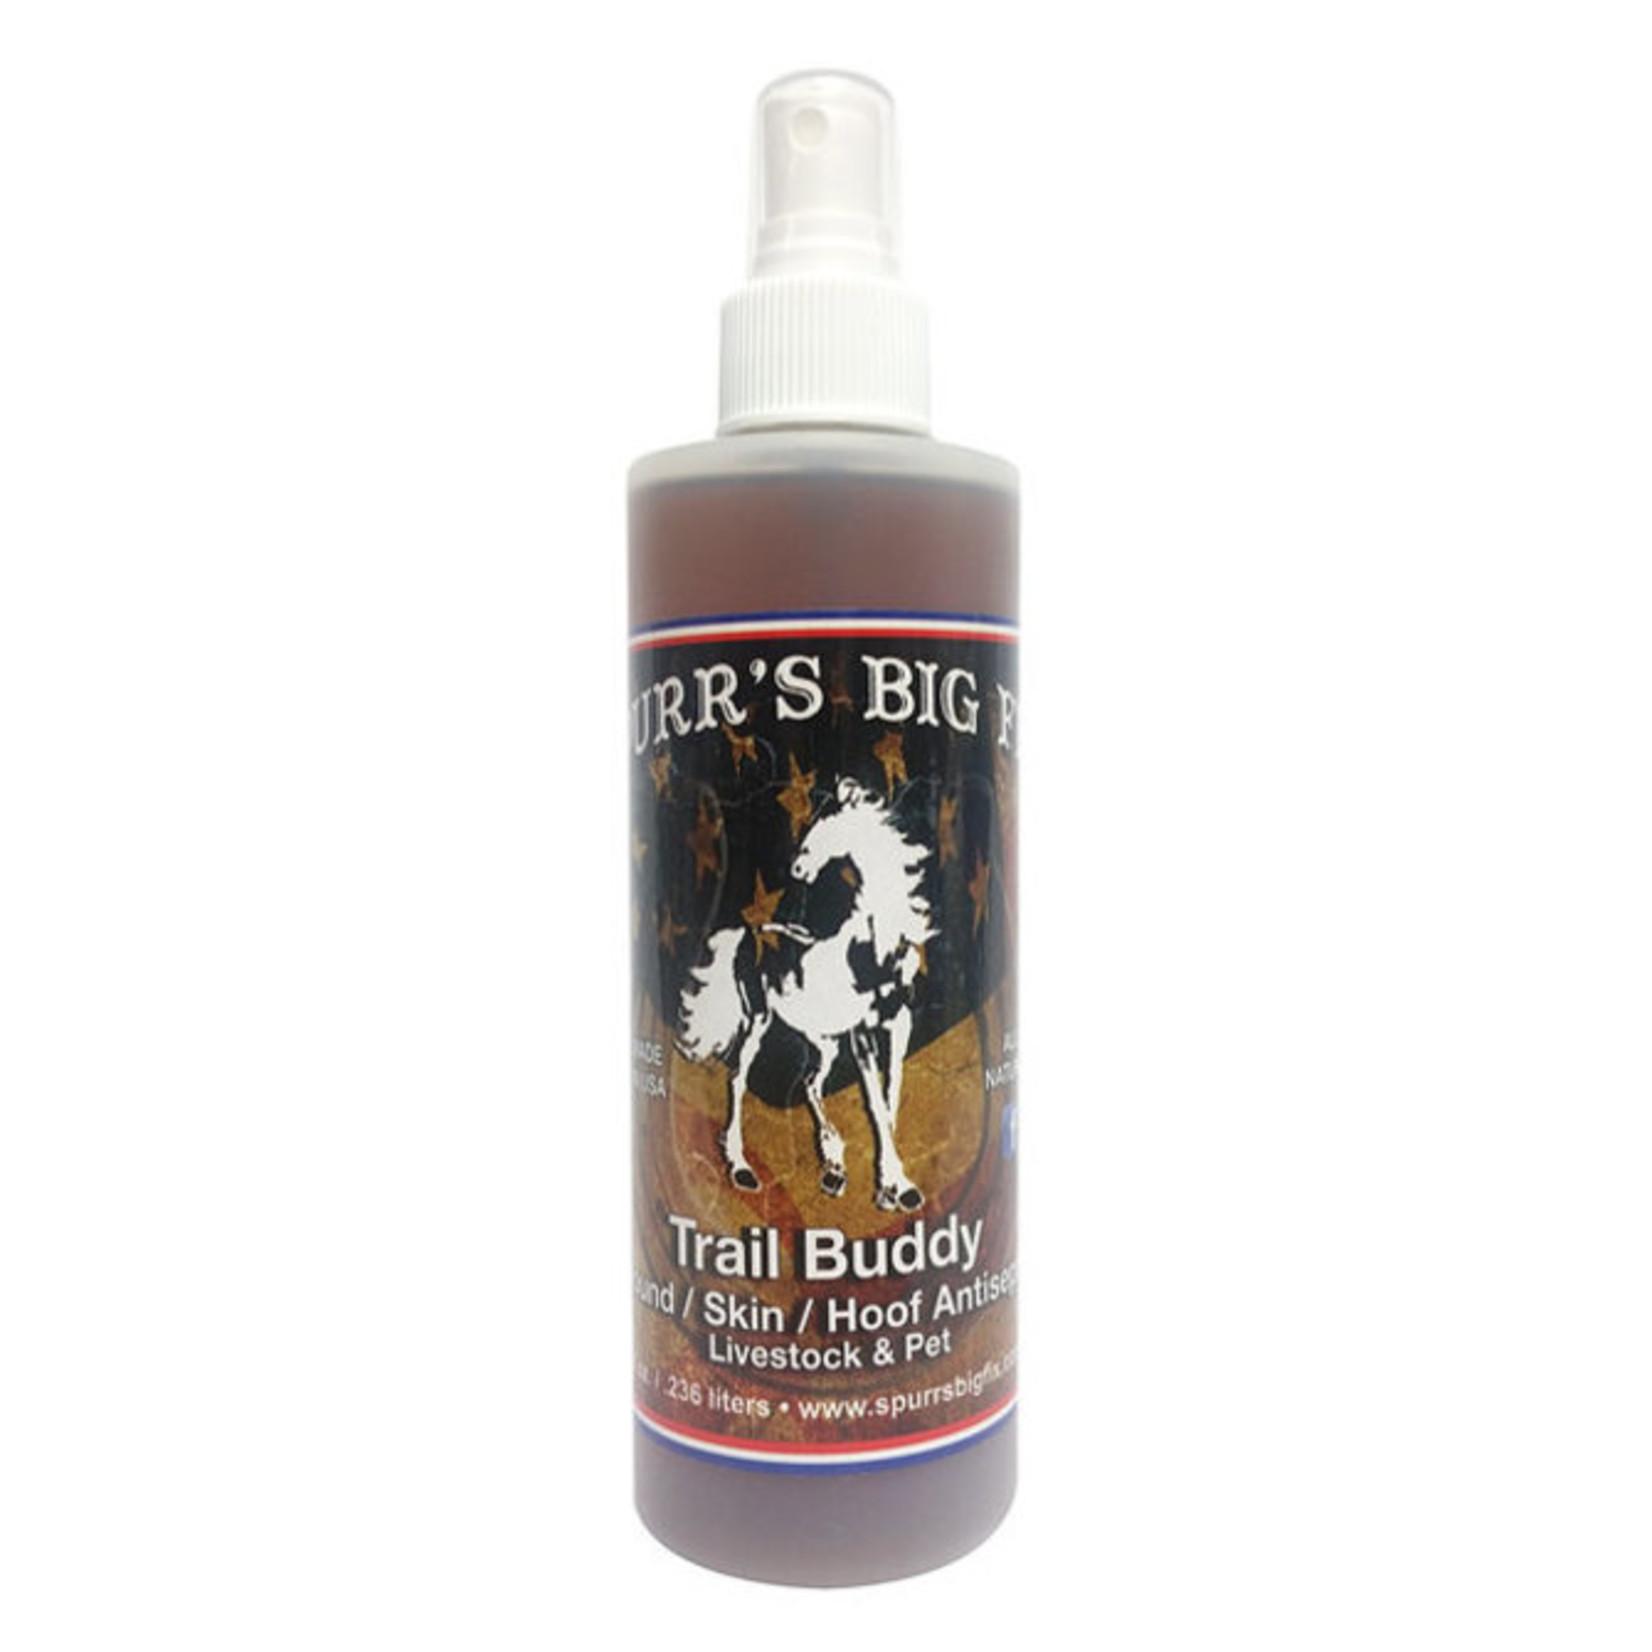 Spurr's Big Fix Spurr's Trail Buddy Antiseptic